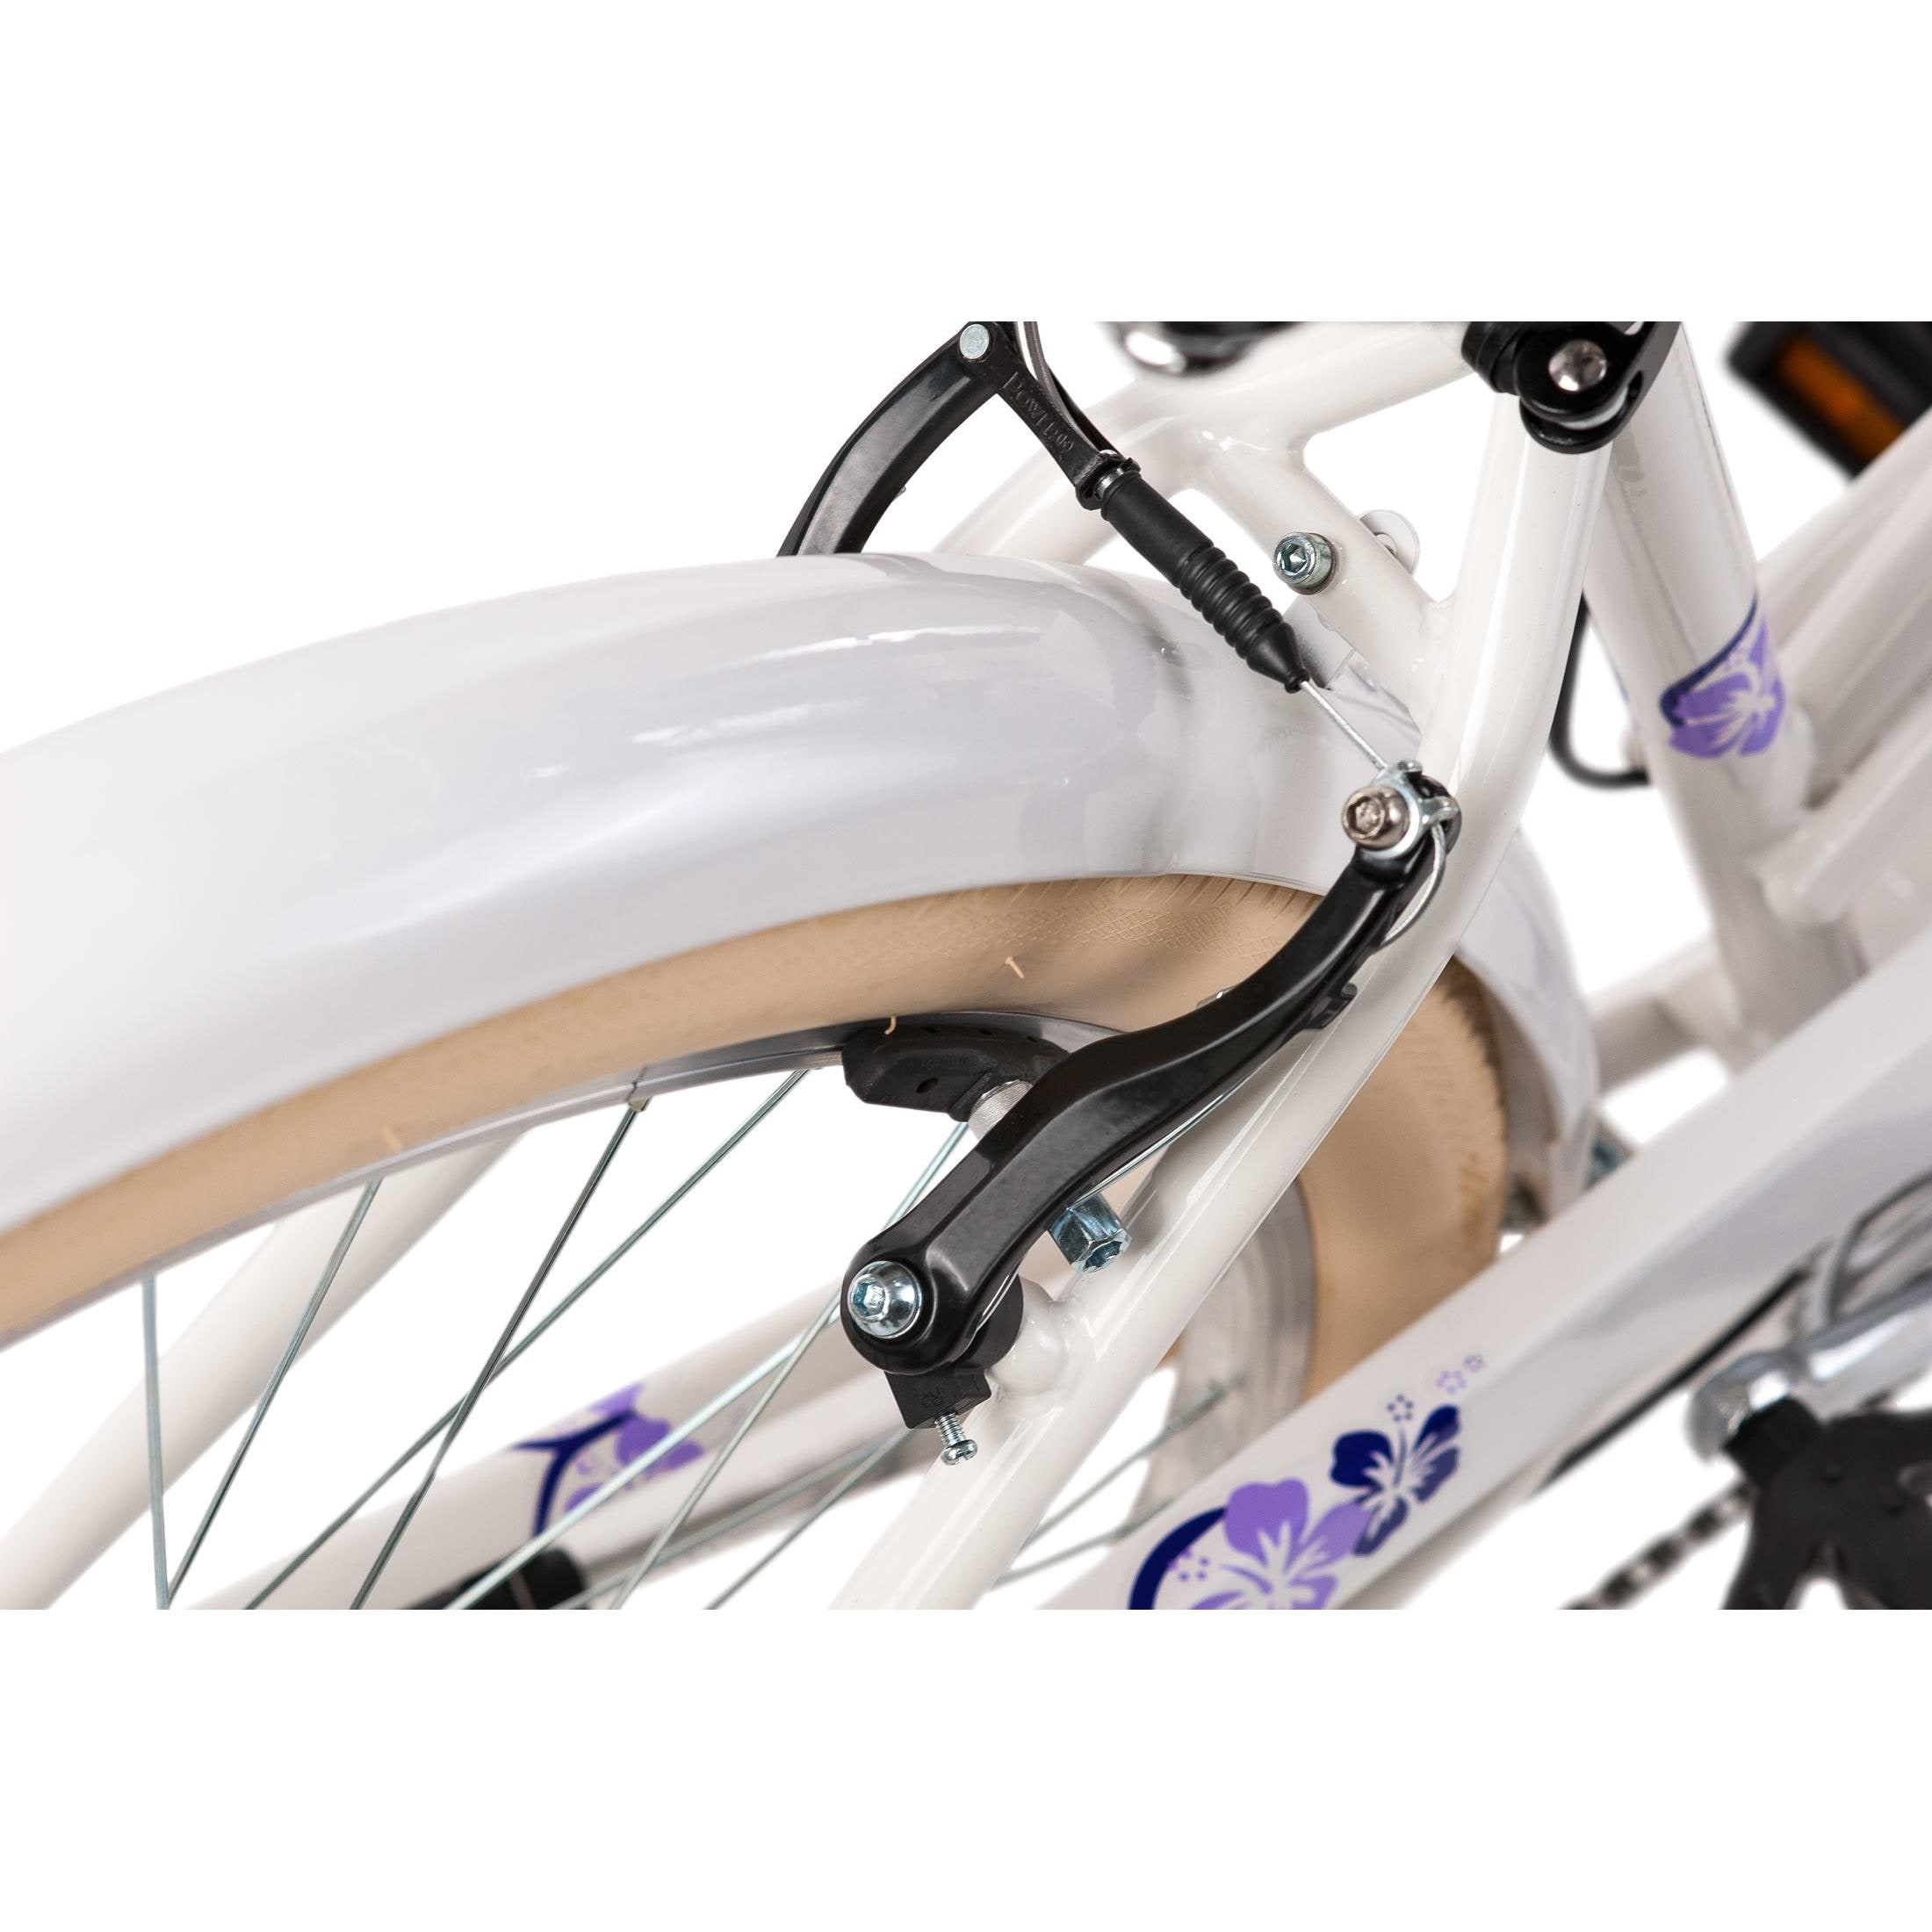 KS Cycling Cargo-Beachcruiser 6 Gänge Kahuna 26 Zoll